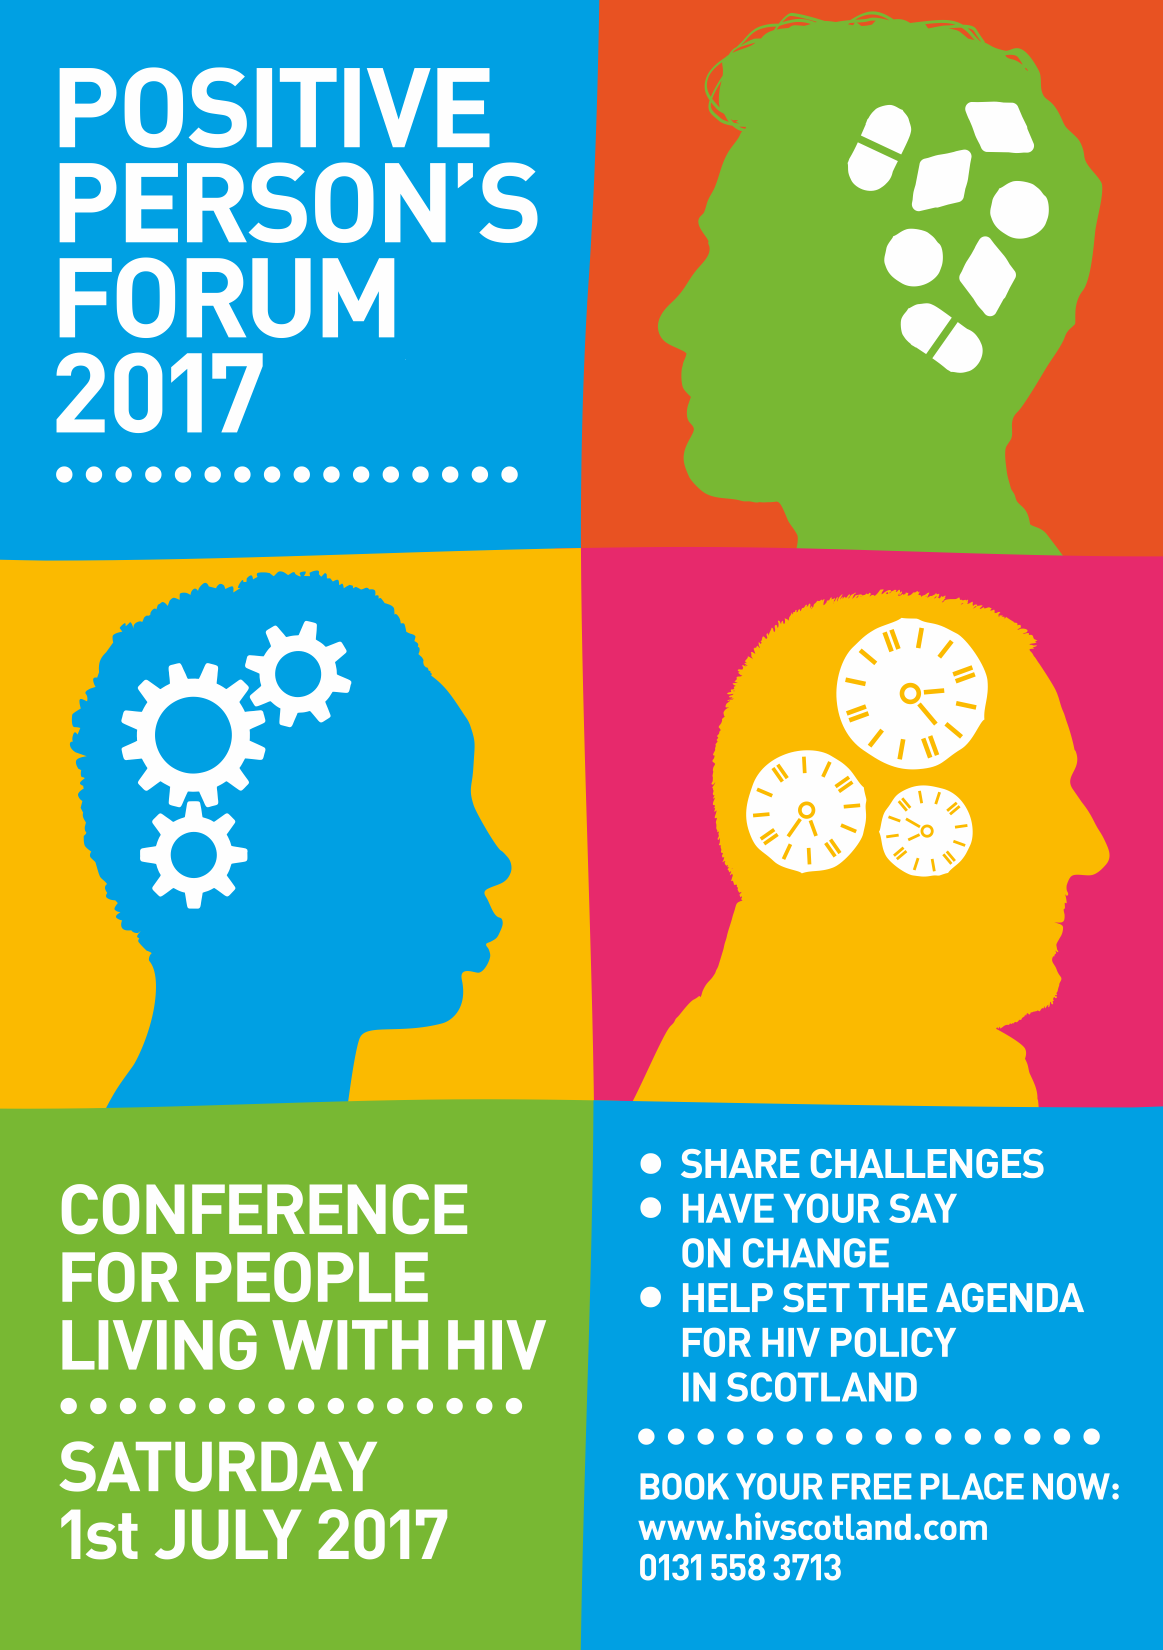 Positive Persons' Forum 2017